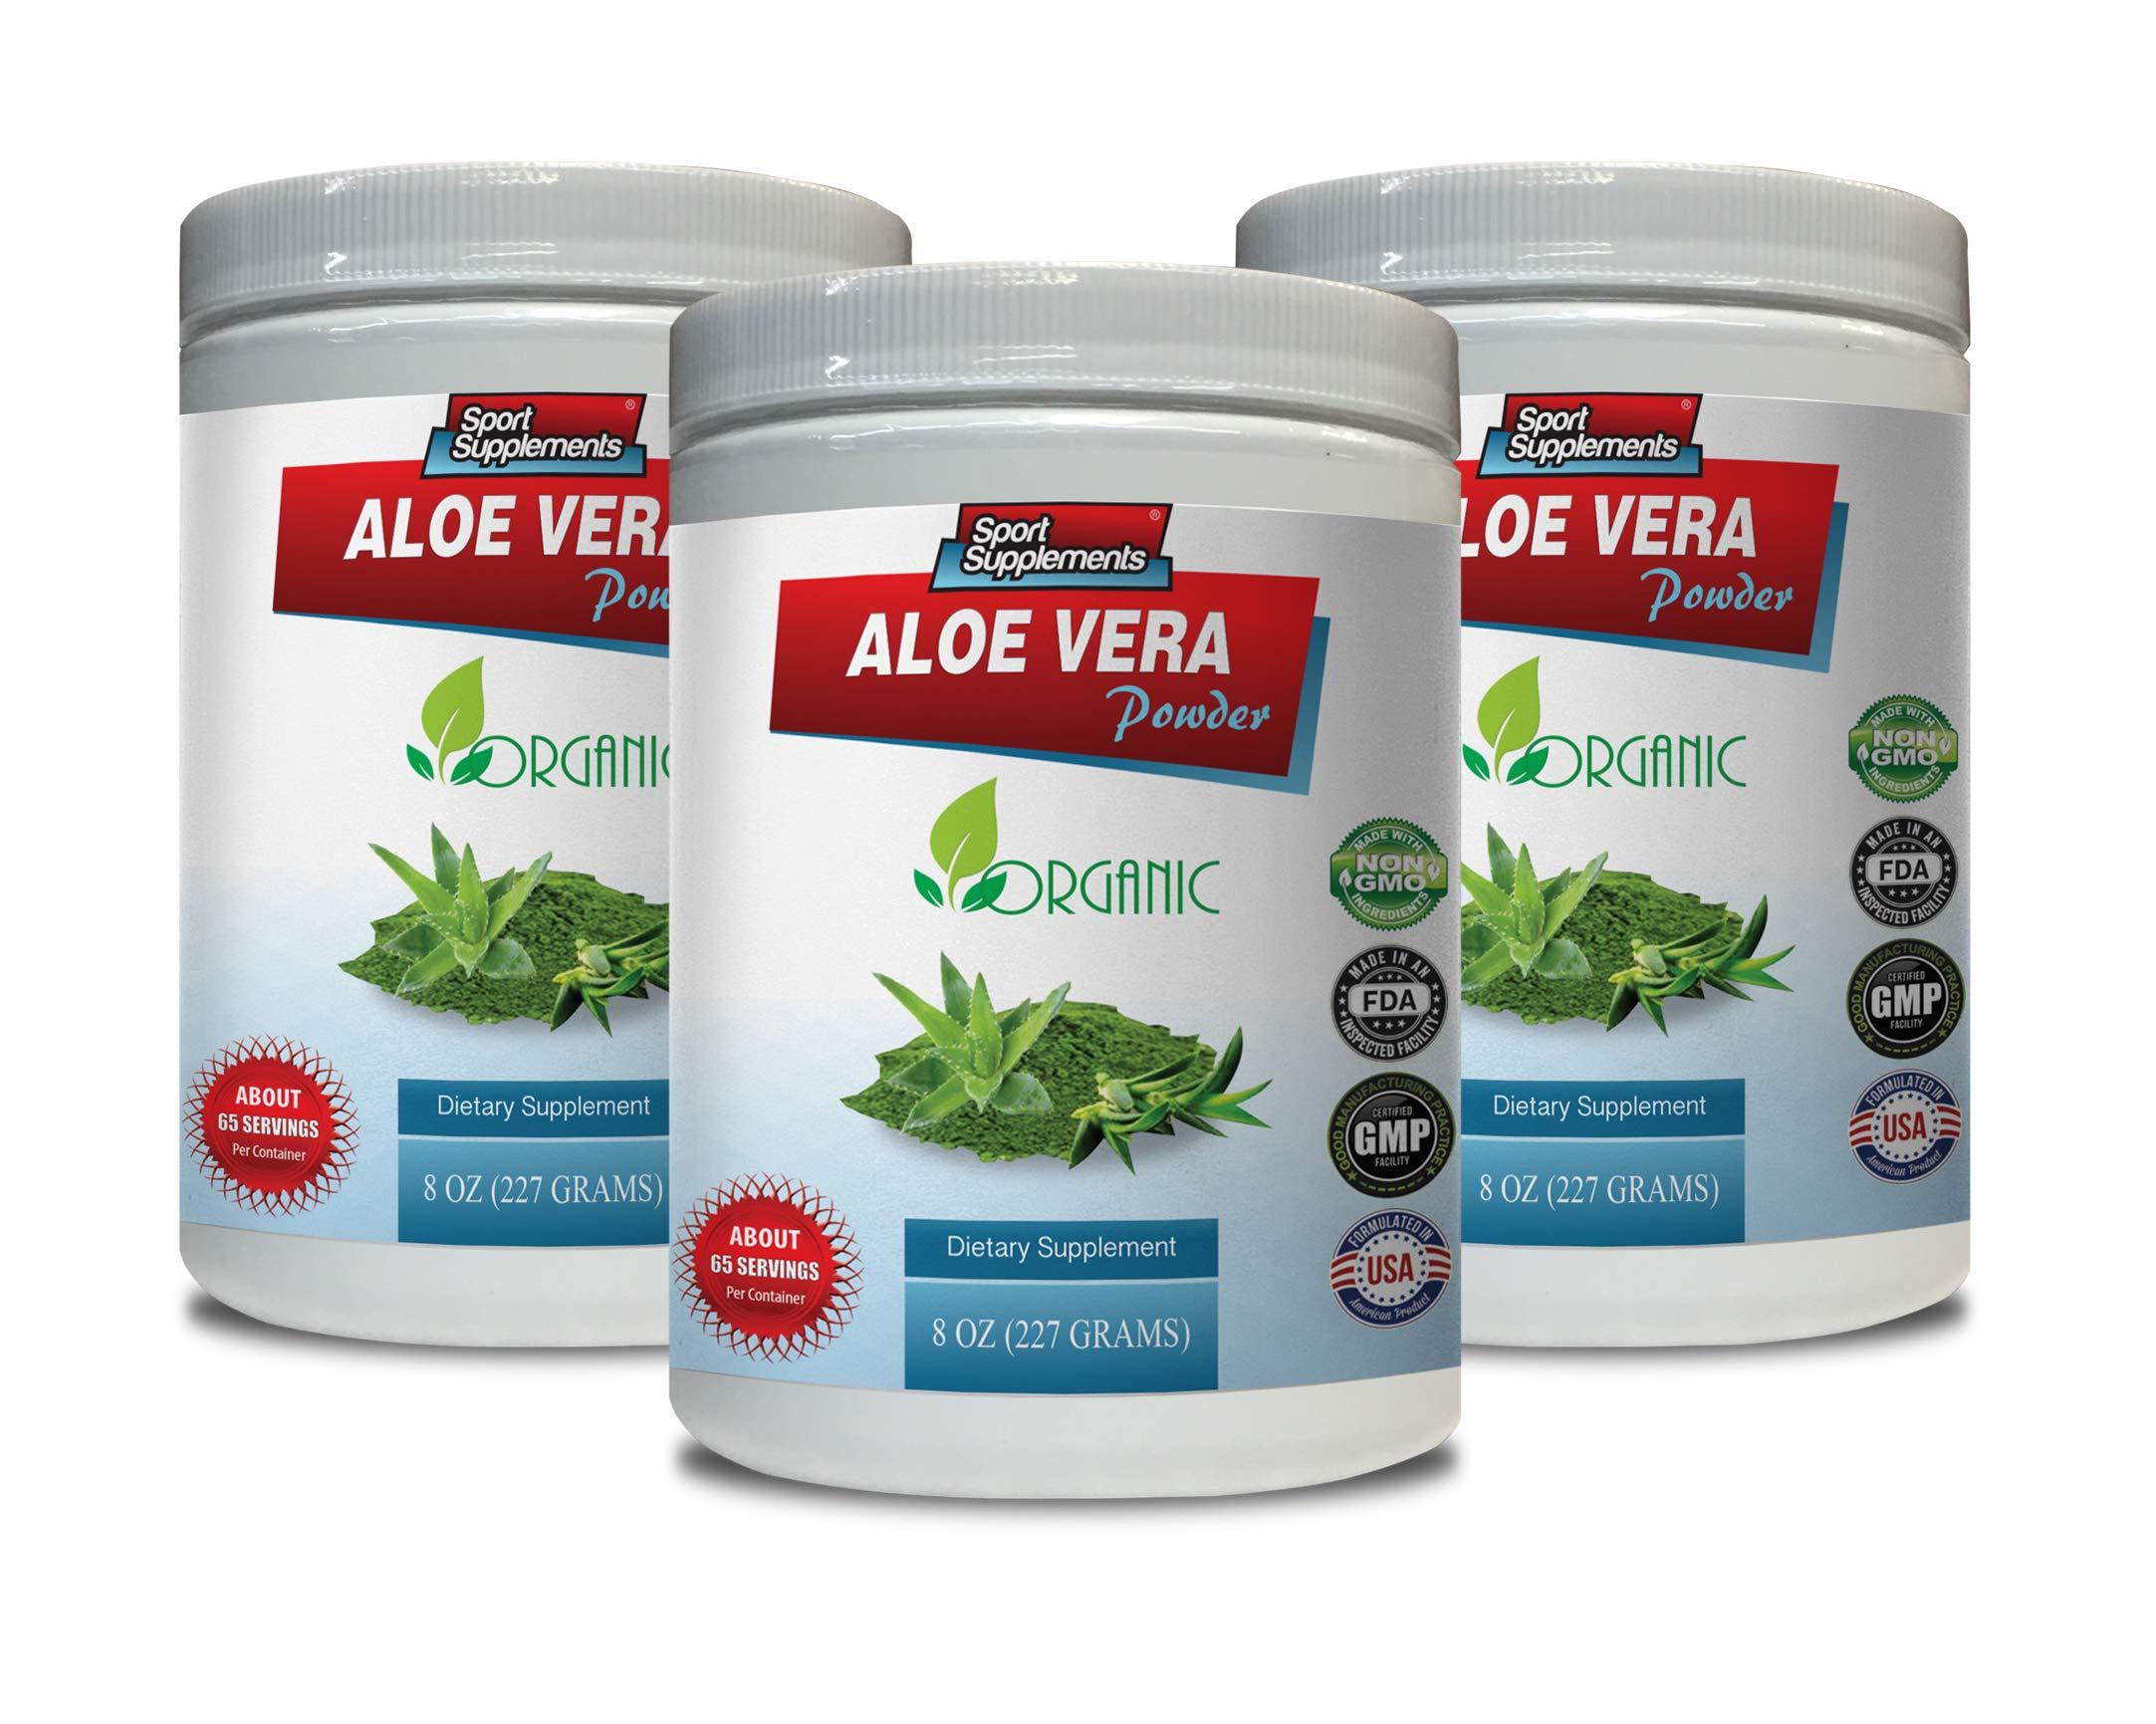 antioxidant Organic - Aloe Vera Powder Organic - Dietary Supplement - Aloe Vera Vitamins Organic for Women - 3 Cans 24 OZ (195 Servings)